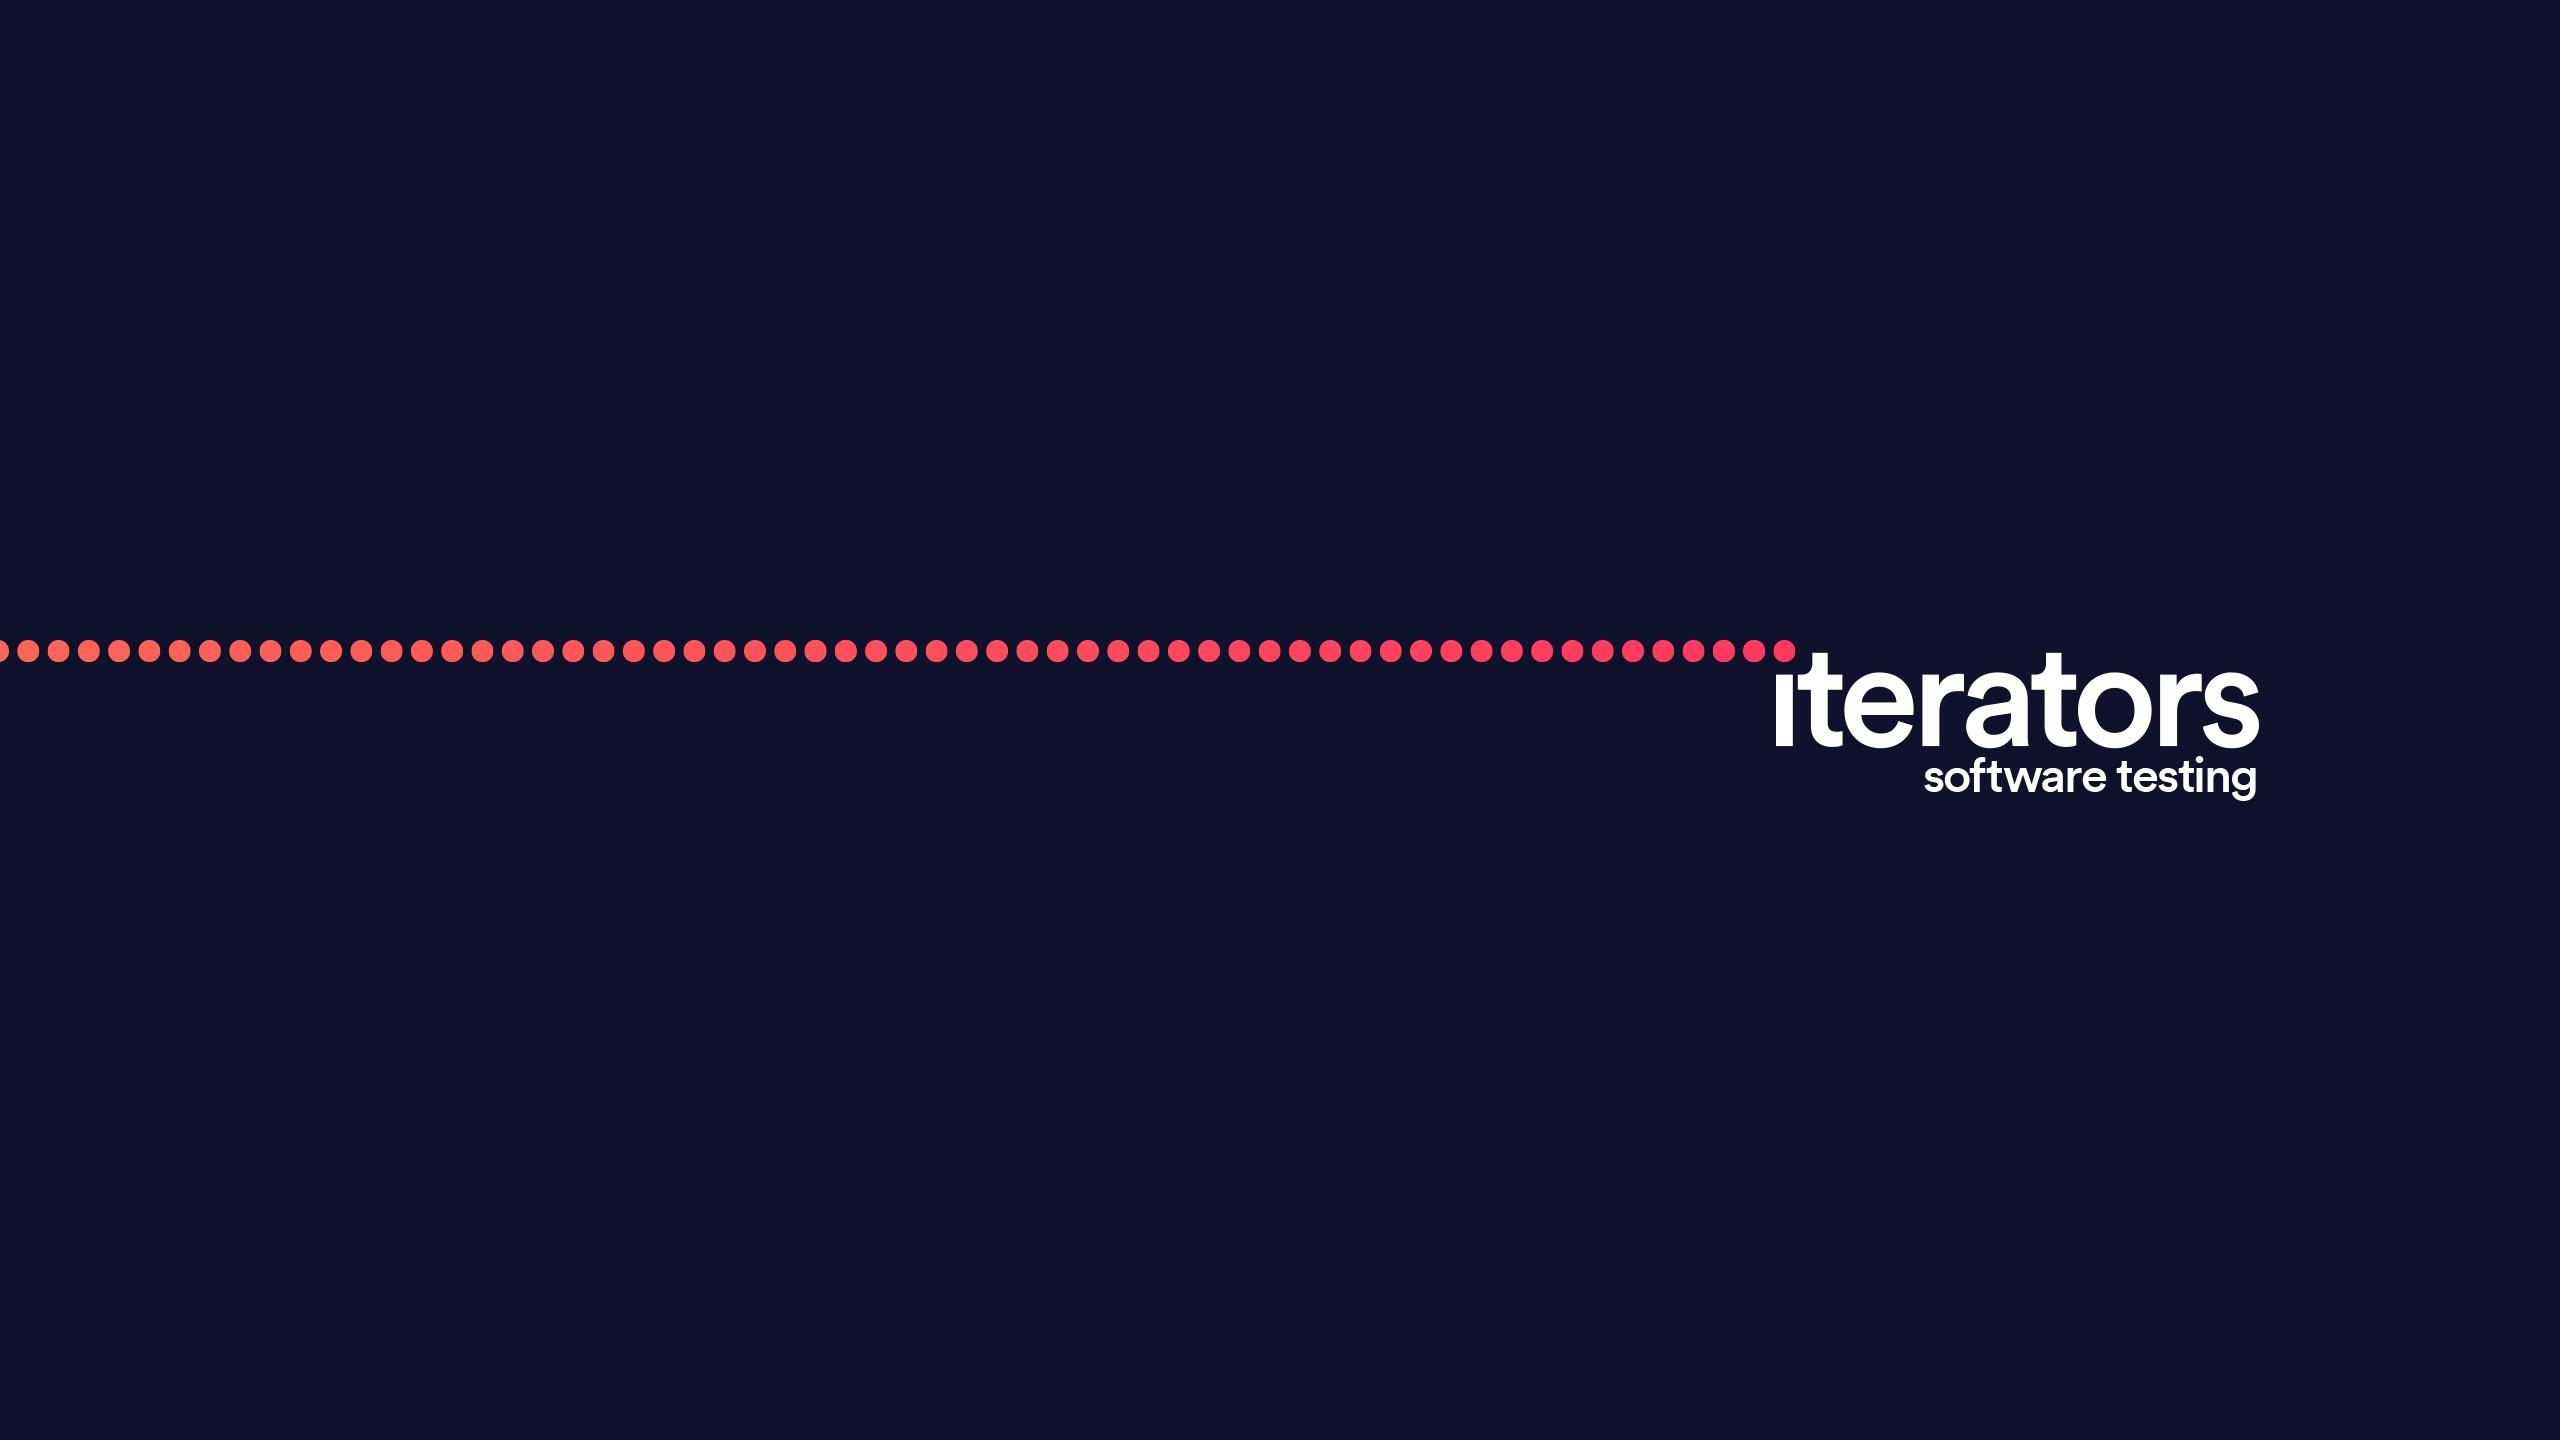 We Are Iterators